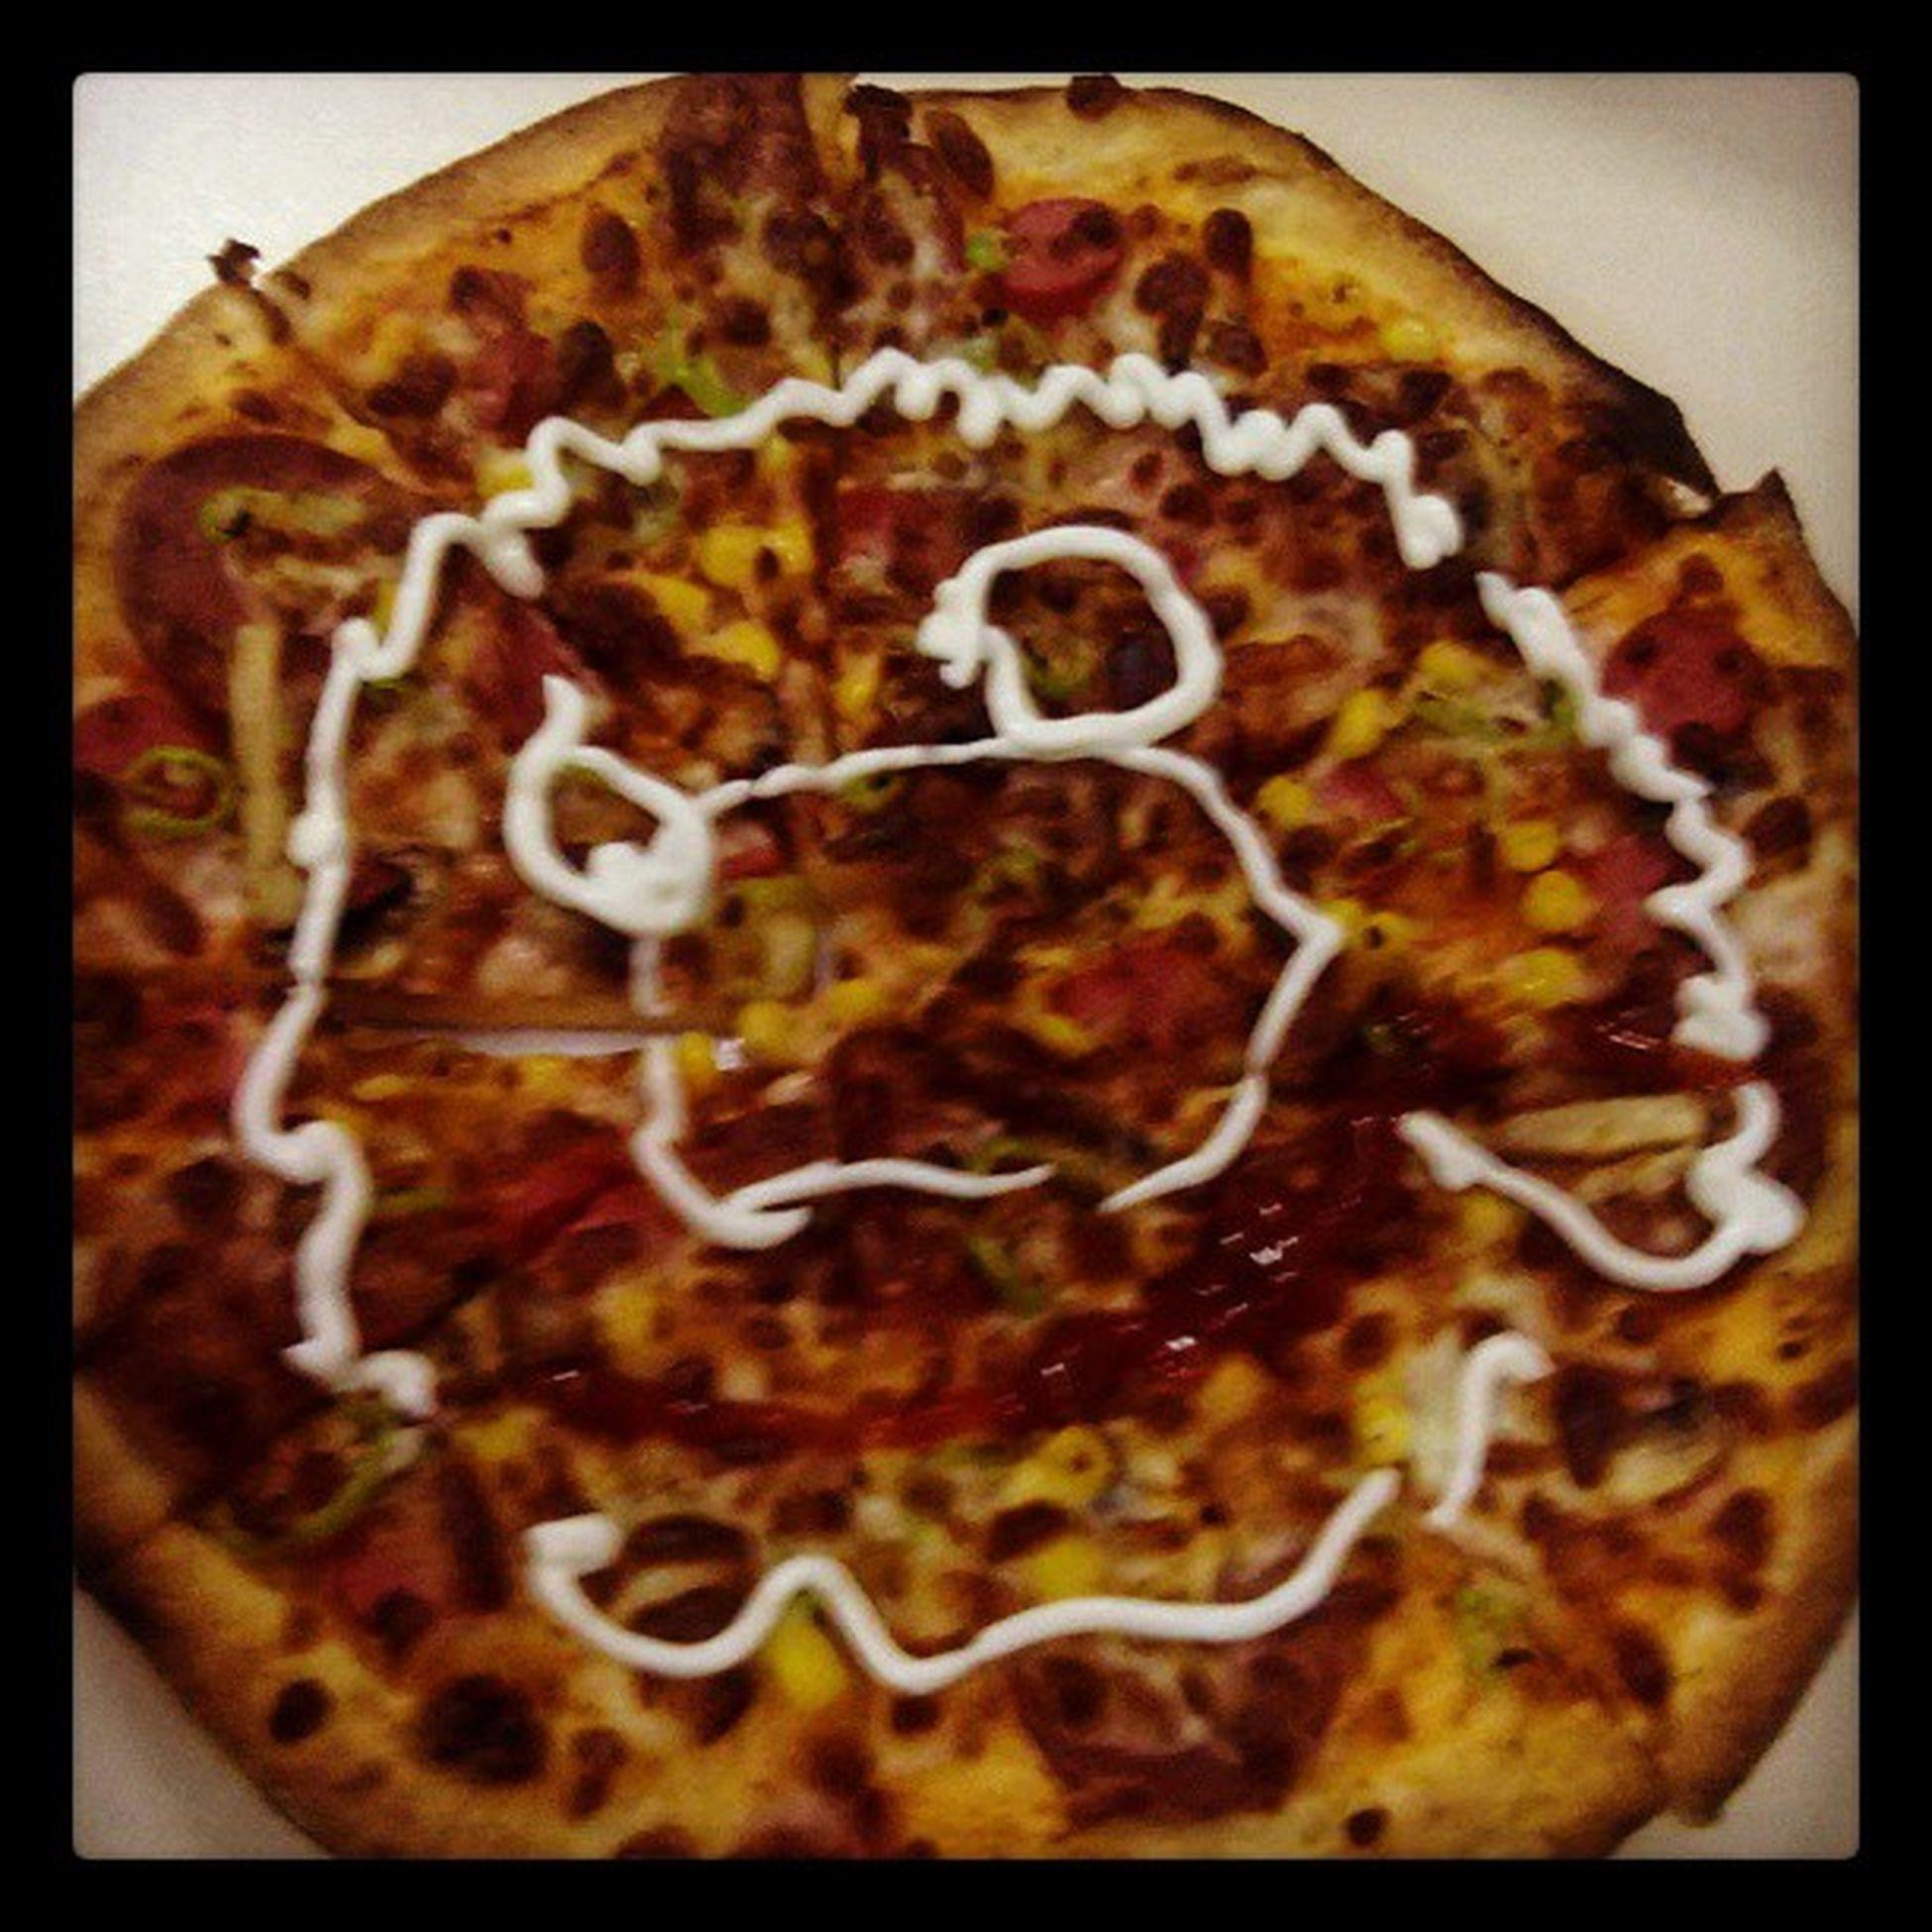 Pizza böyle yapïlïr:-)Hunggry Acikmak G ülen pizza Intstagram ac beatiful home